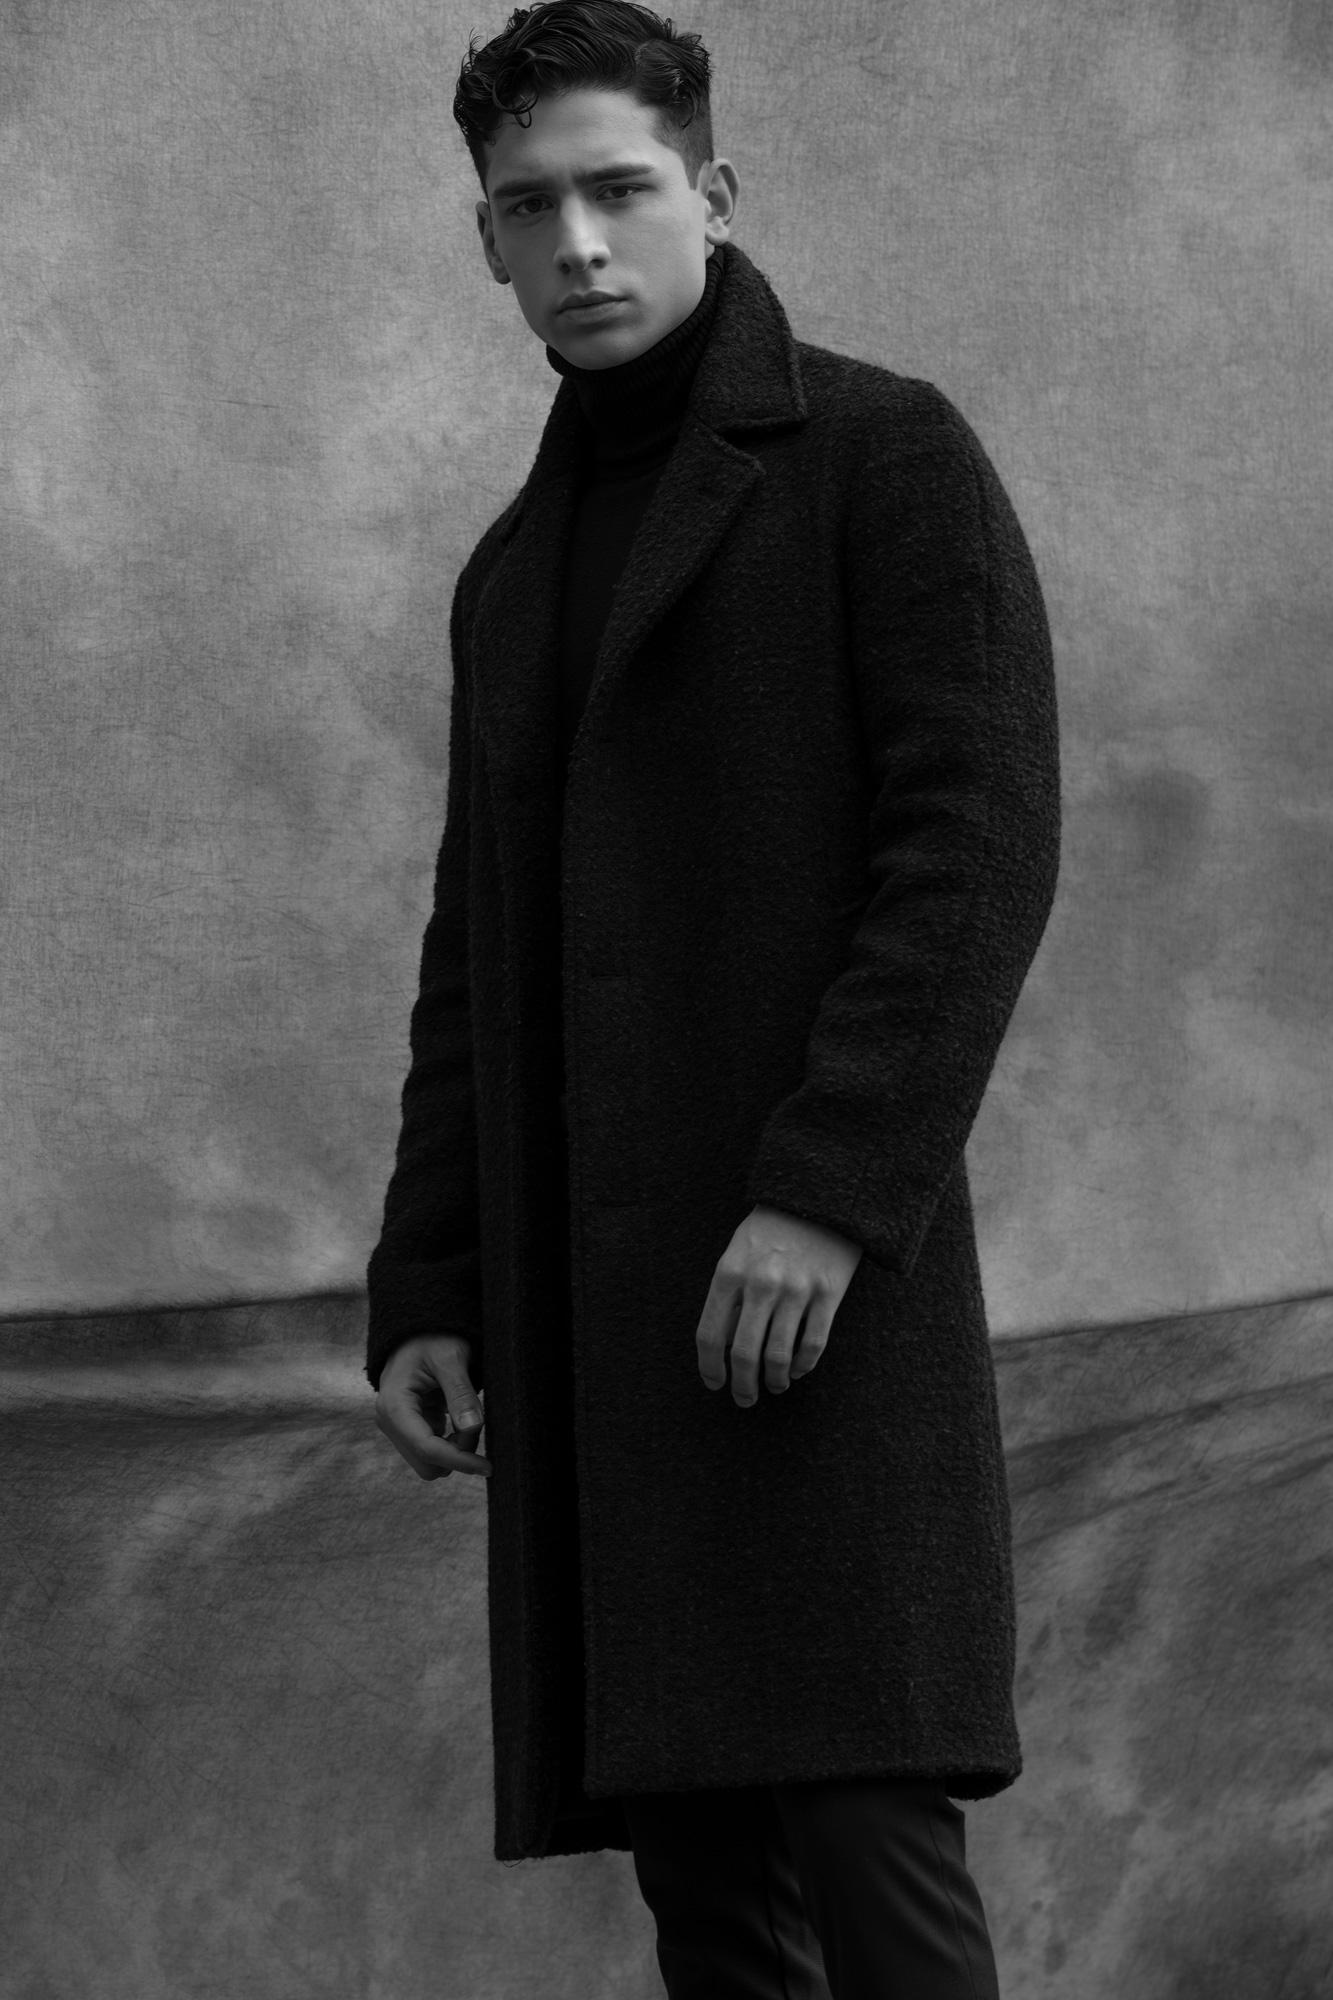 joao-ngalia-men-fashion-photographer-2.jpg